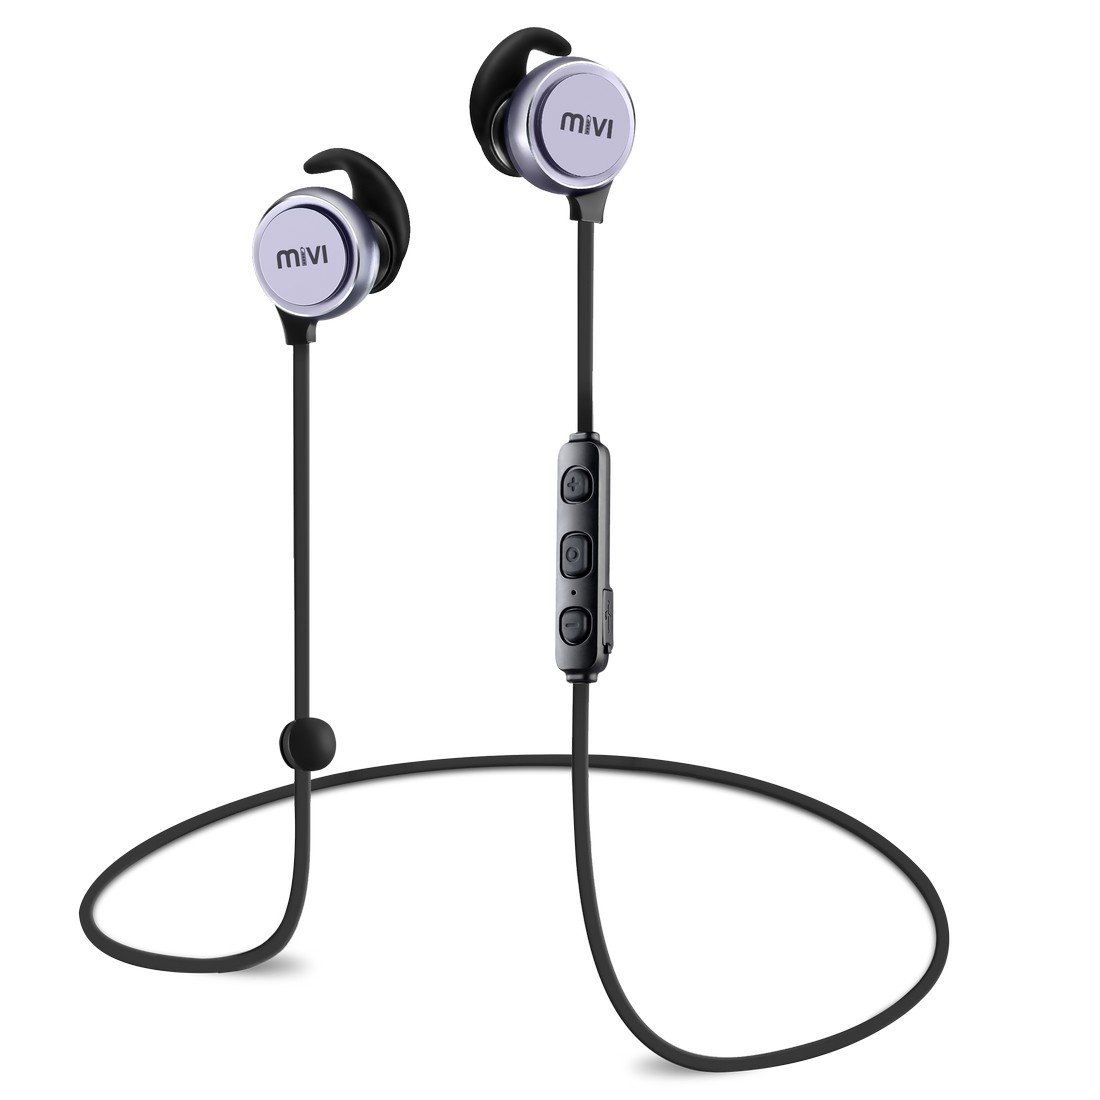 Mivi Thunder Beats Wireless Bluetooth Earphones with Stereo